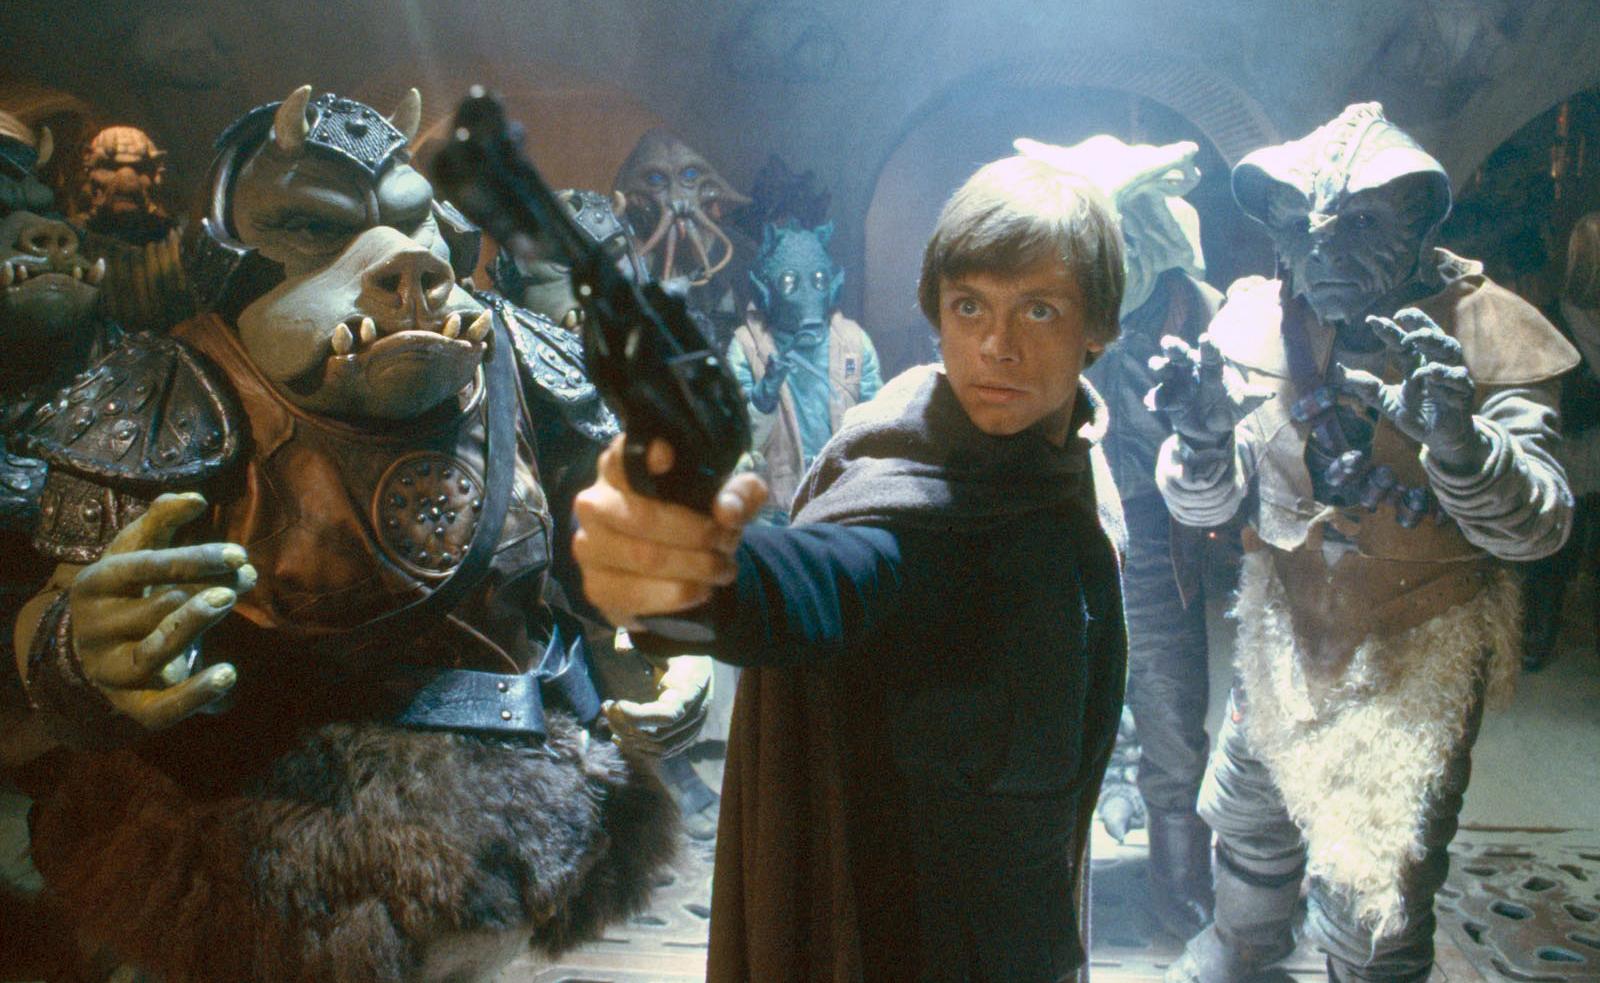 Jabba The Hutt Fucks Princess Leia Ele journey to the force awakens: return of the jedi – the beat